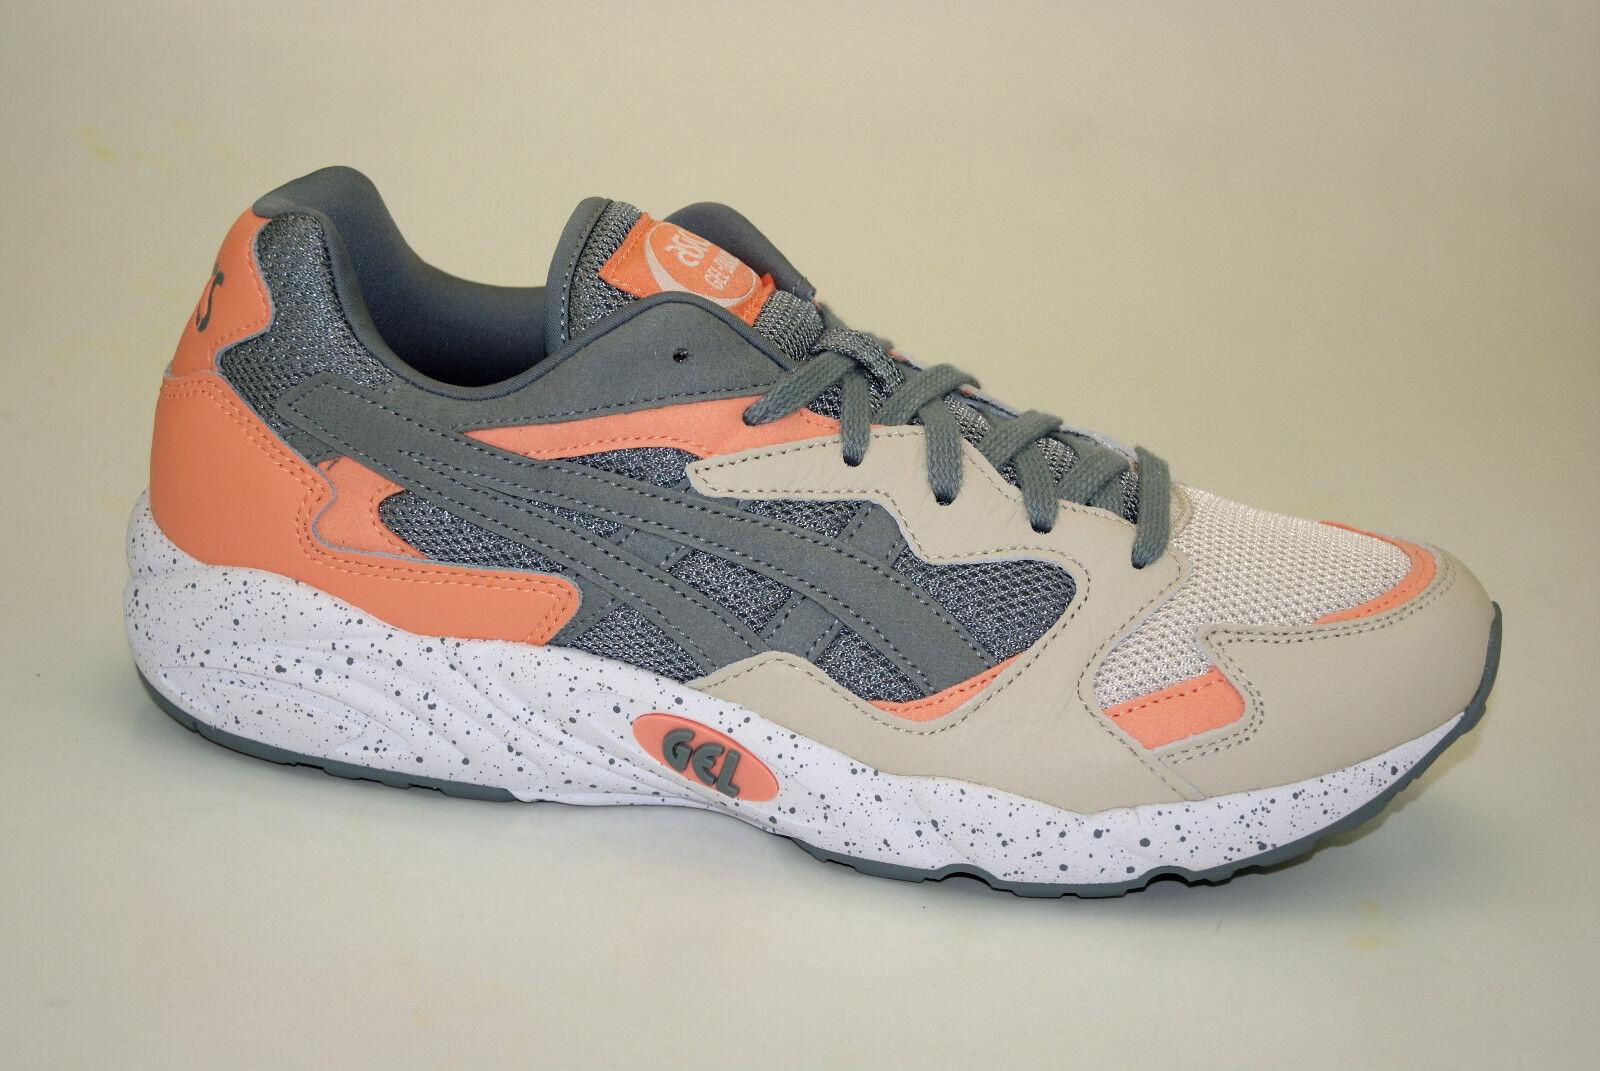 san francisco d85c4 2b4ae Asics Tiger Tiger Tiger Gel Diablo Chaussures / Baskets de Sport Hommes  H809L-1111 1c6460